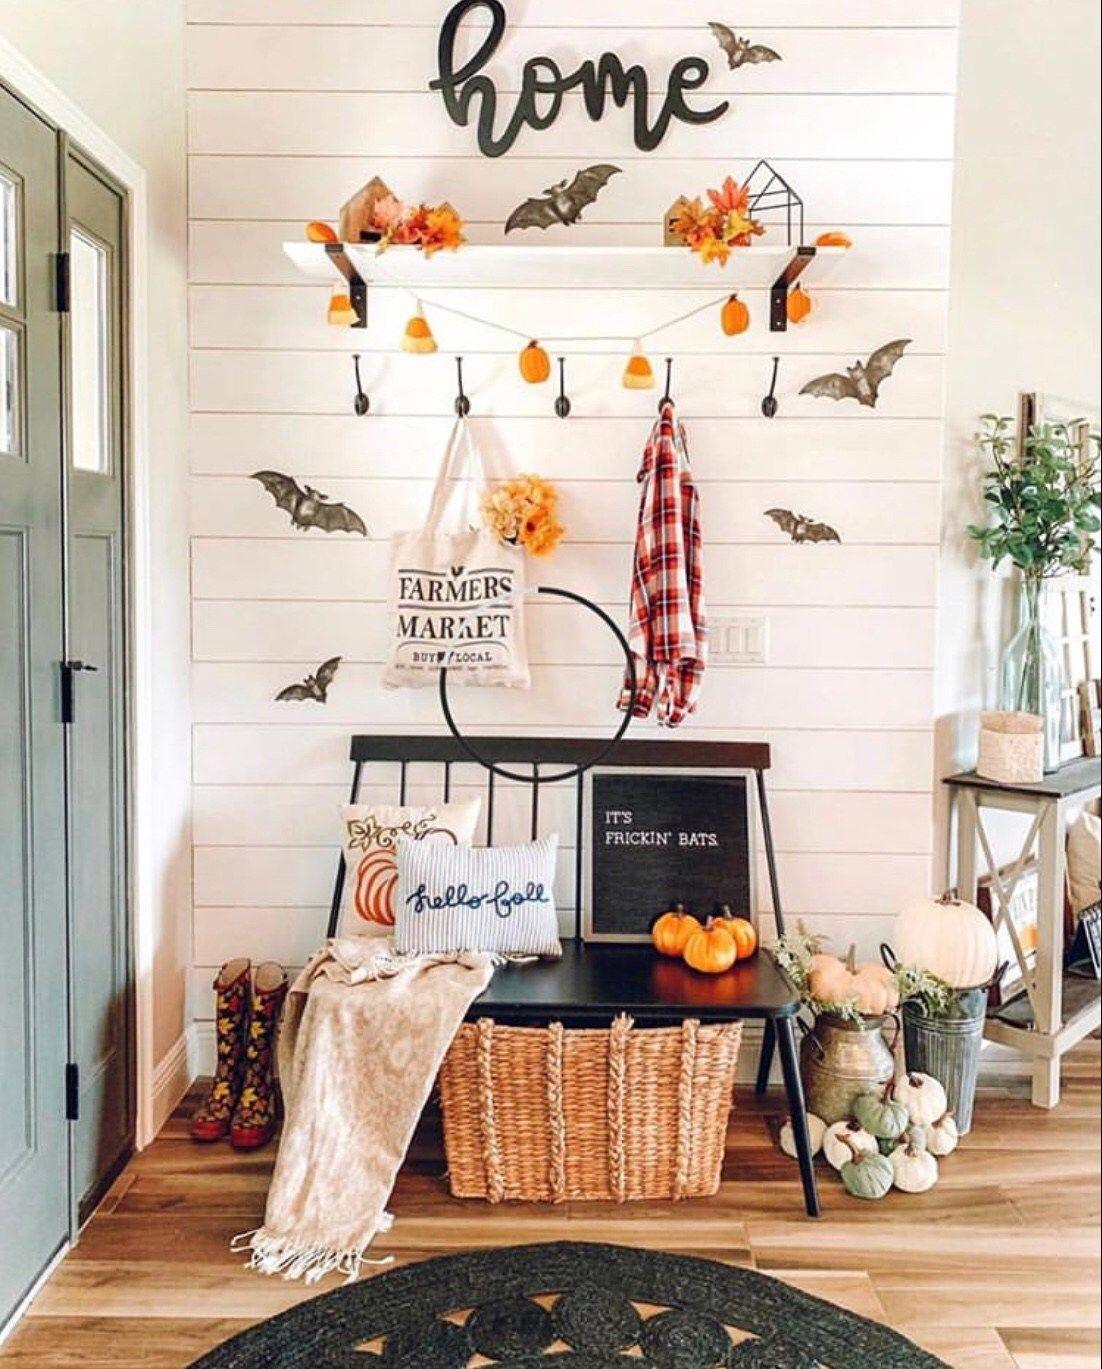 11 Easy Halloween Decor Ideas For Your Home The Wonder Cottage Fall Home Decor Decor Fall Halloween Decor